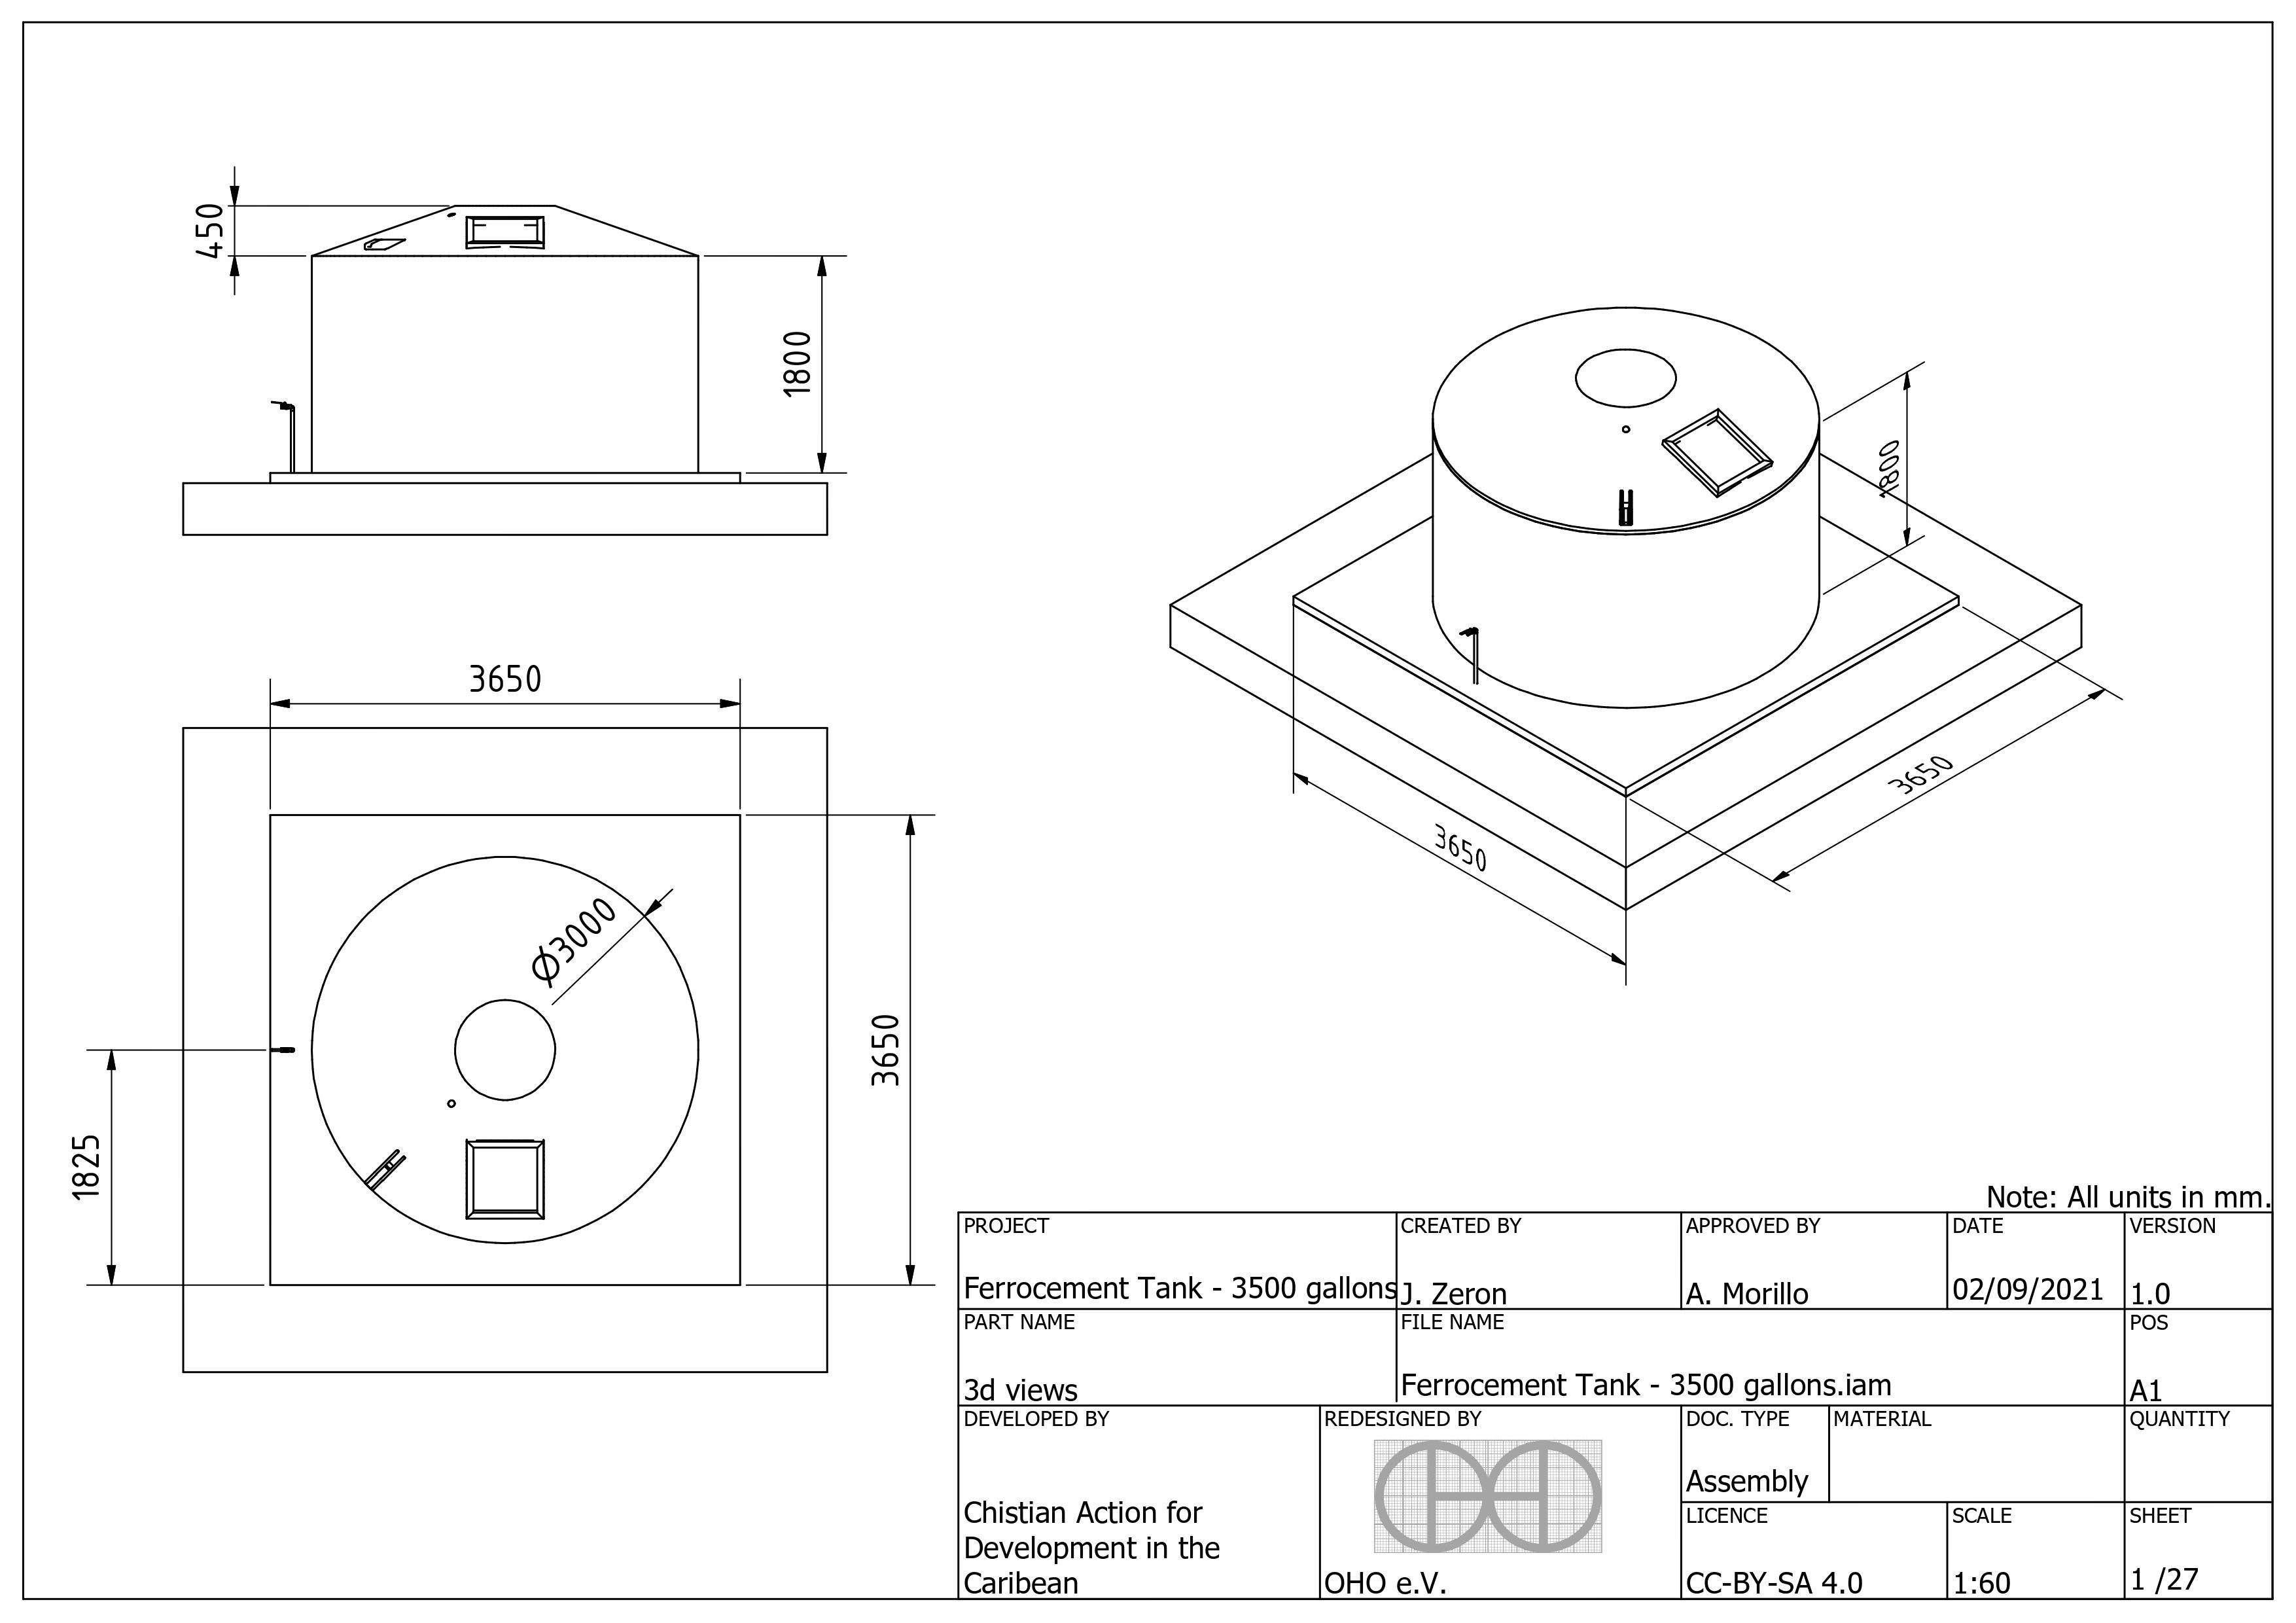 Ehr ft ferrocement-tank-3500-gallons 0001.jpg